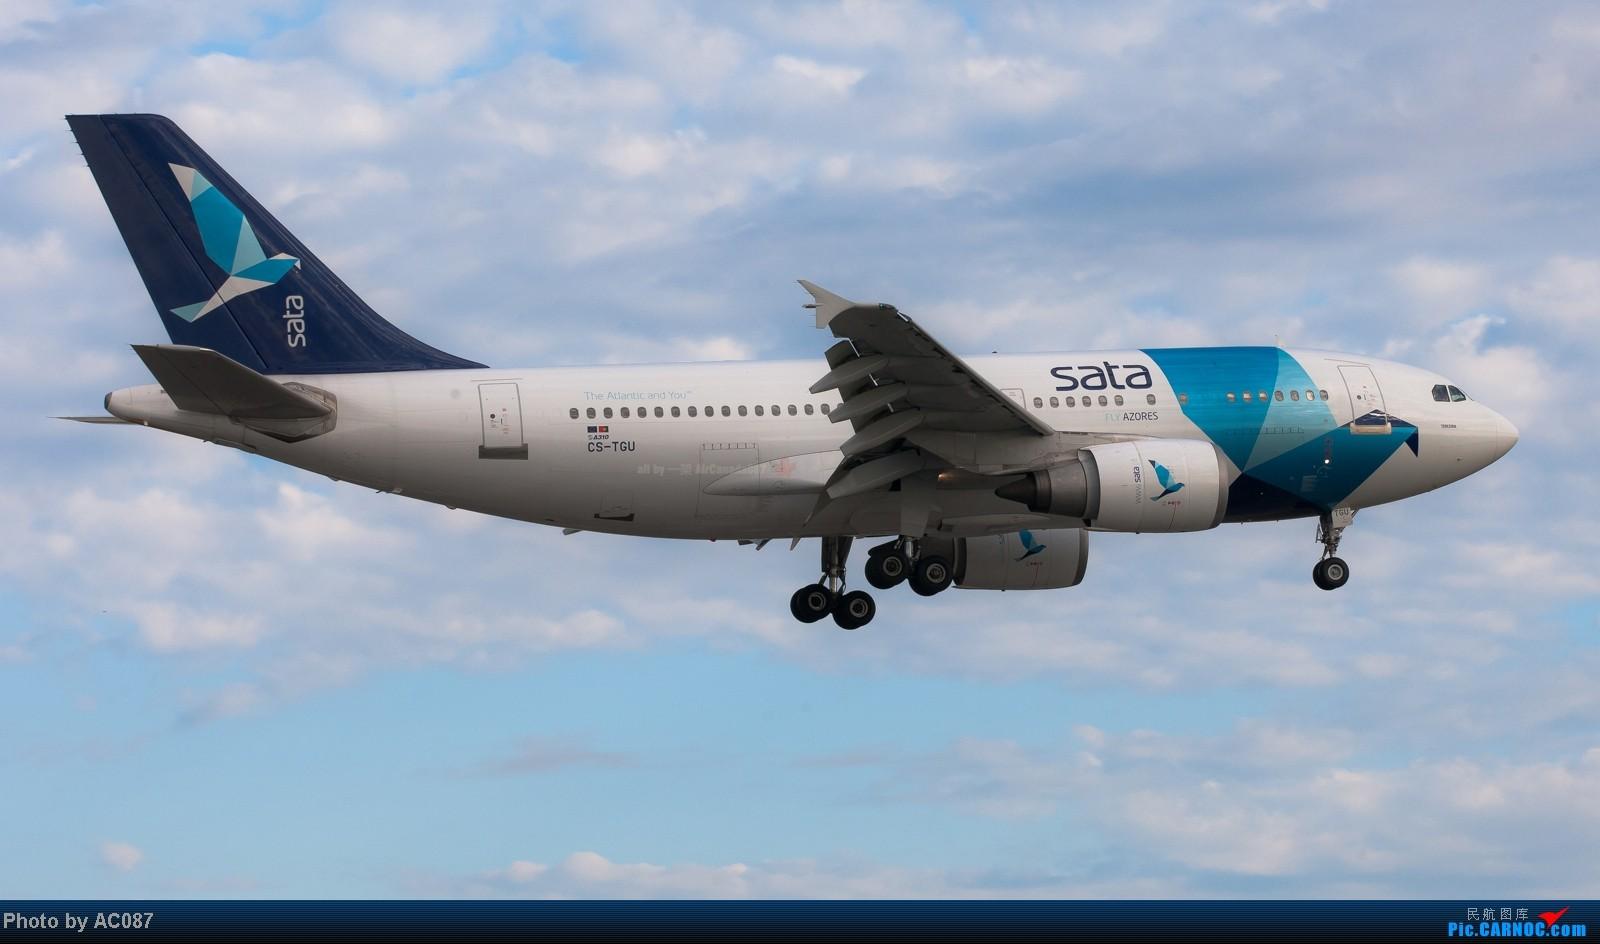 Re:【杭州飞友会】AC087,浅水一年,上来冒个泡,多伦多拍飞机.东航世博会,加航第一架787,冰岛航空,葡萄牙航空各种稀有机型